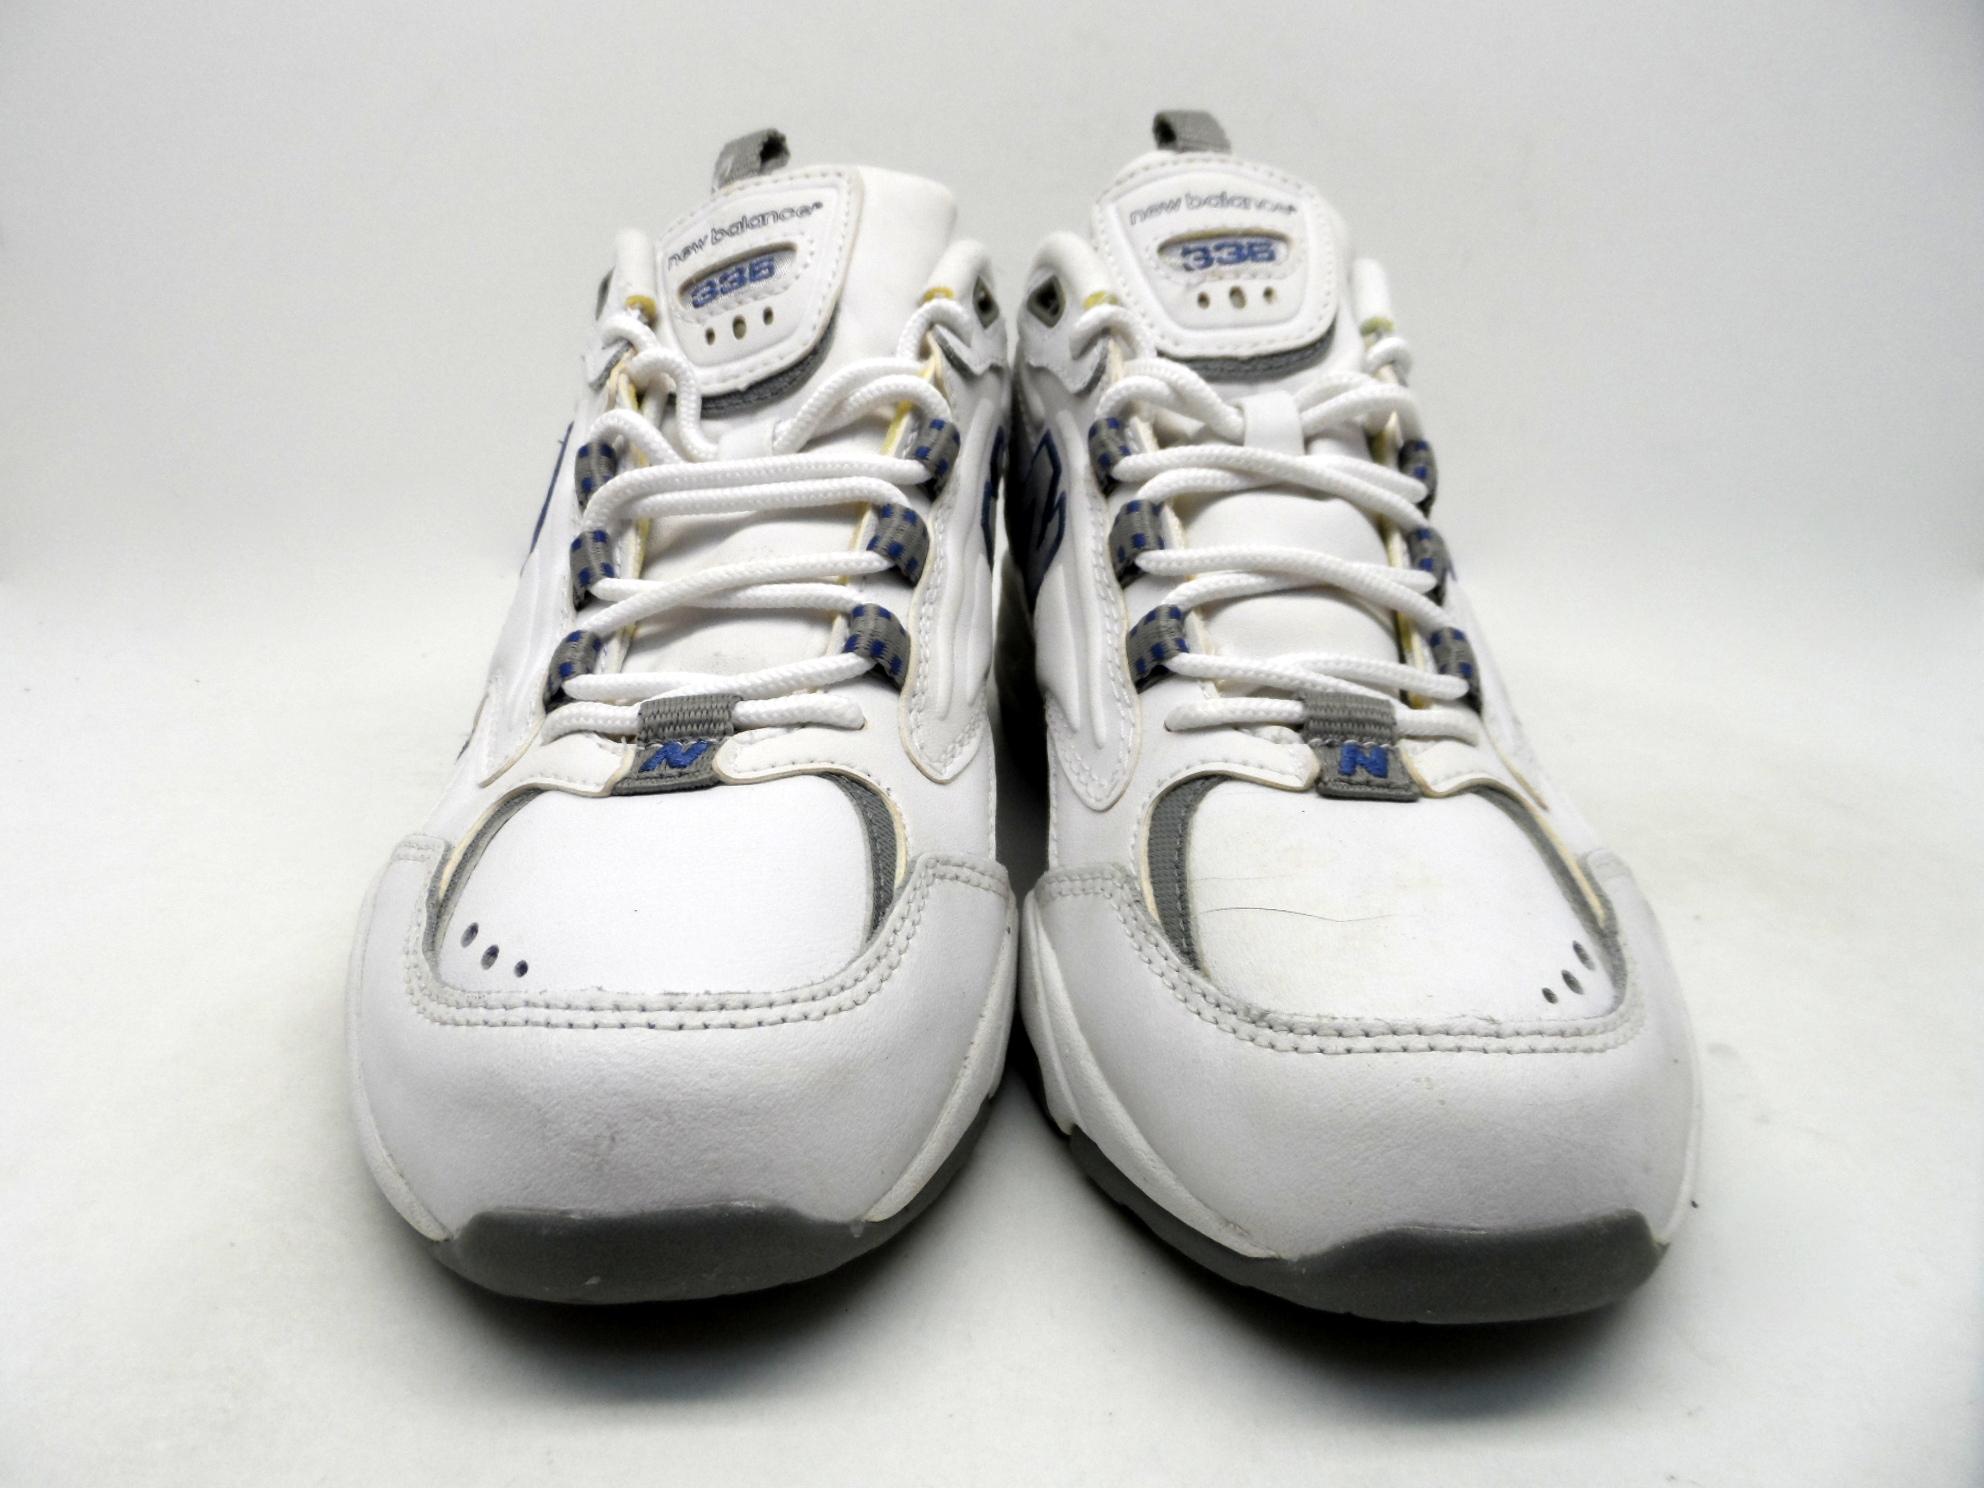 new balance 336 latest new balance shoes